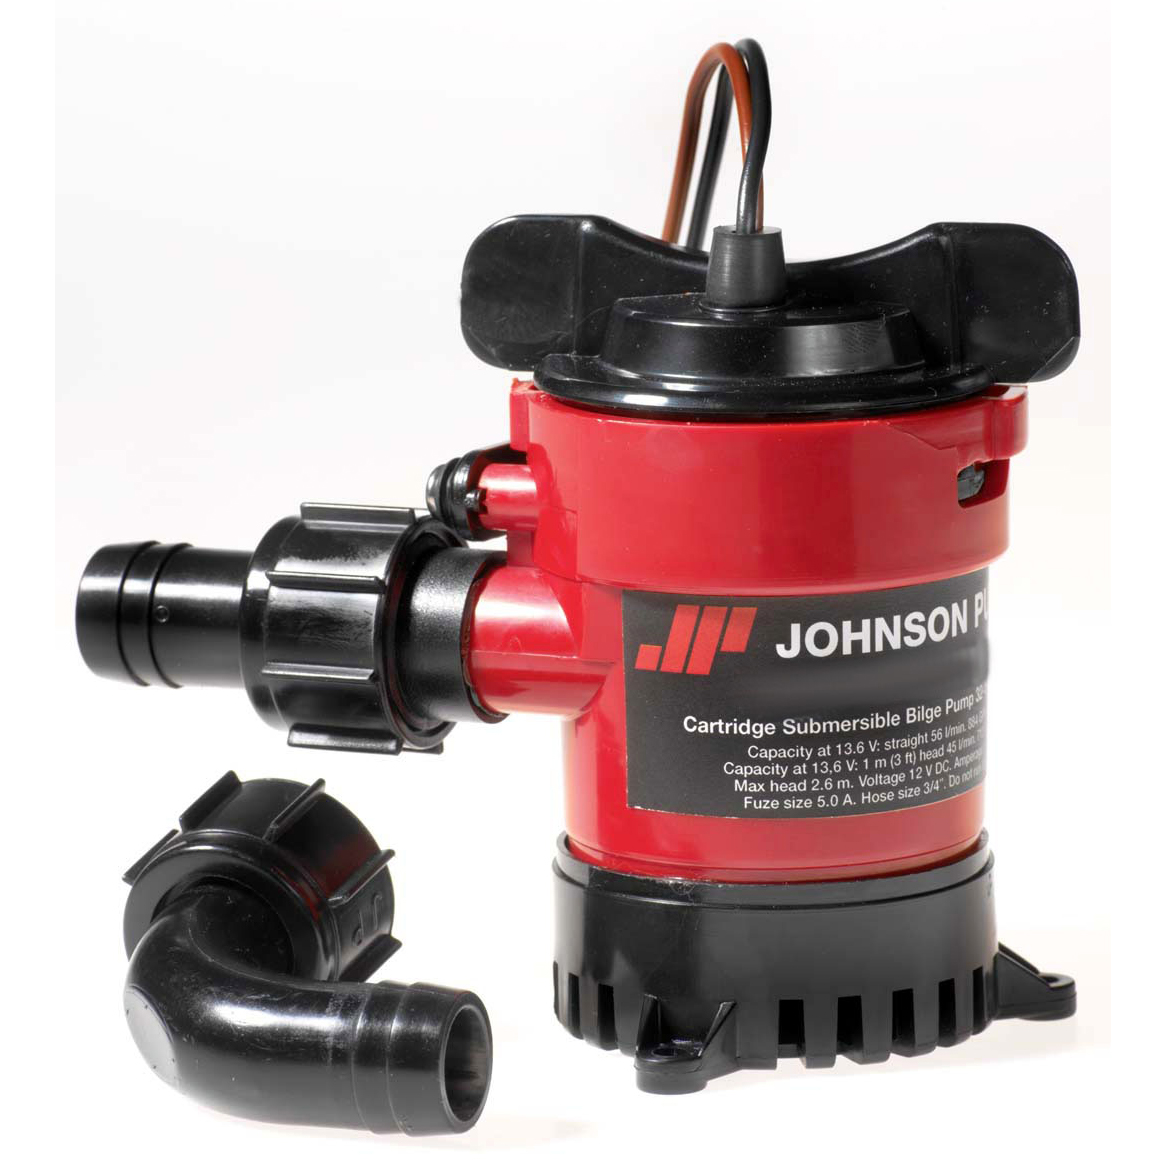 Johnson Pump Cartridge Bilge Pump, 750 GPH photo